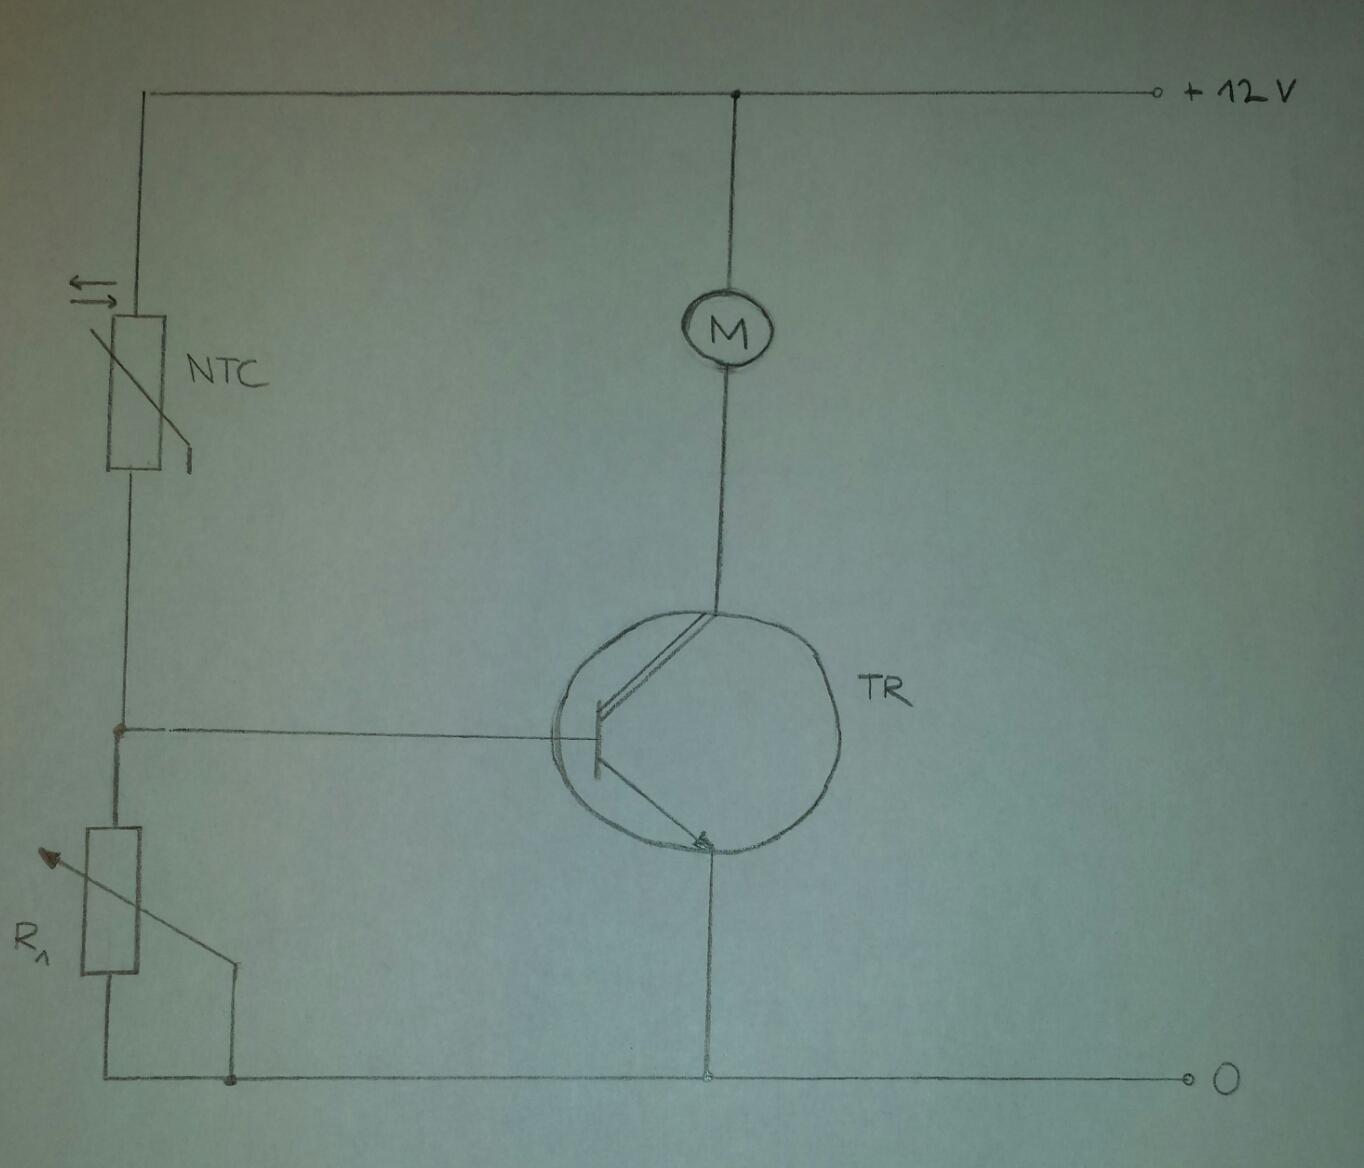 l fter schaltung mit temperatursensor ntc schule. Black Bedroom Furniture Sets. Home Design Ideas